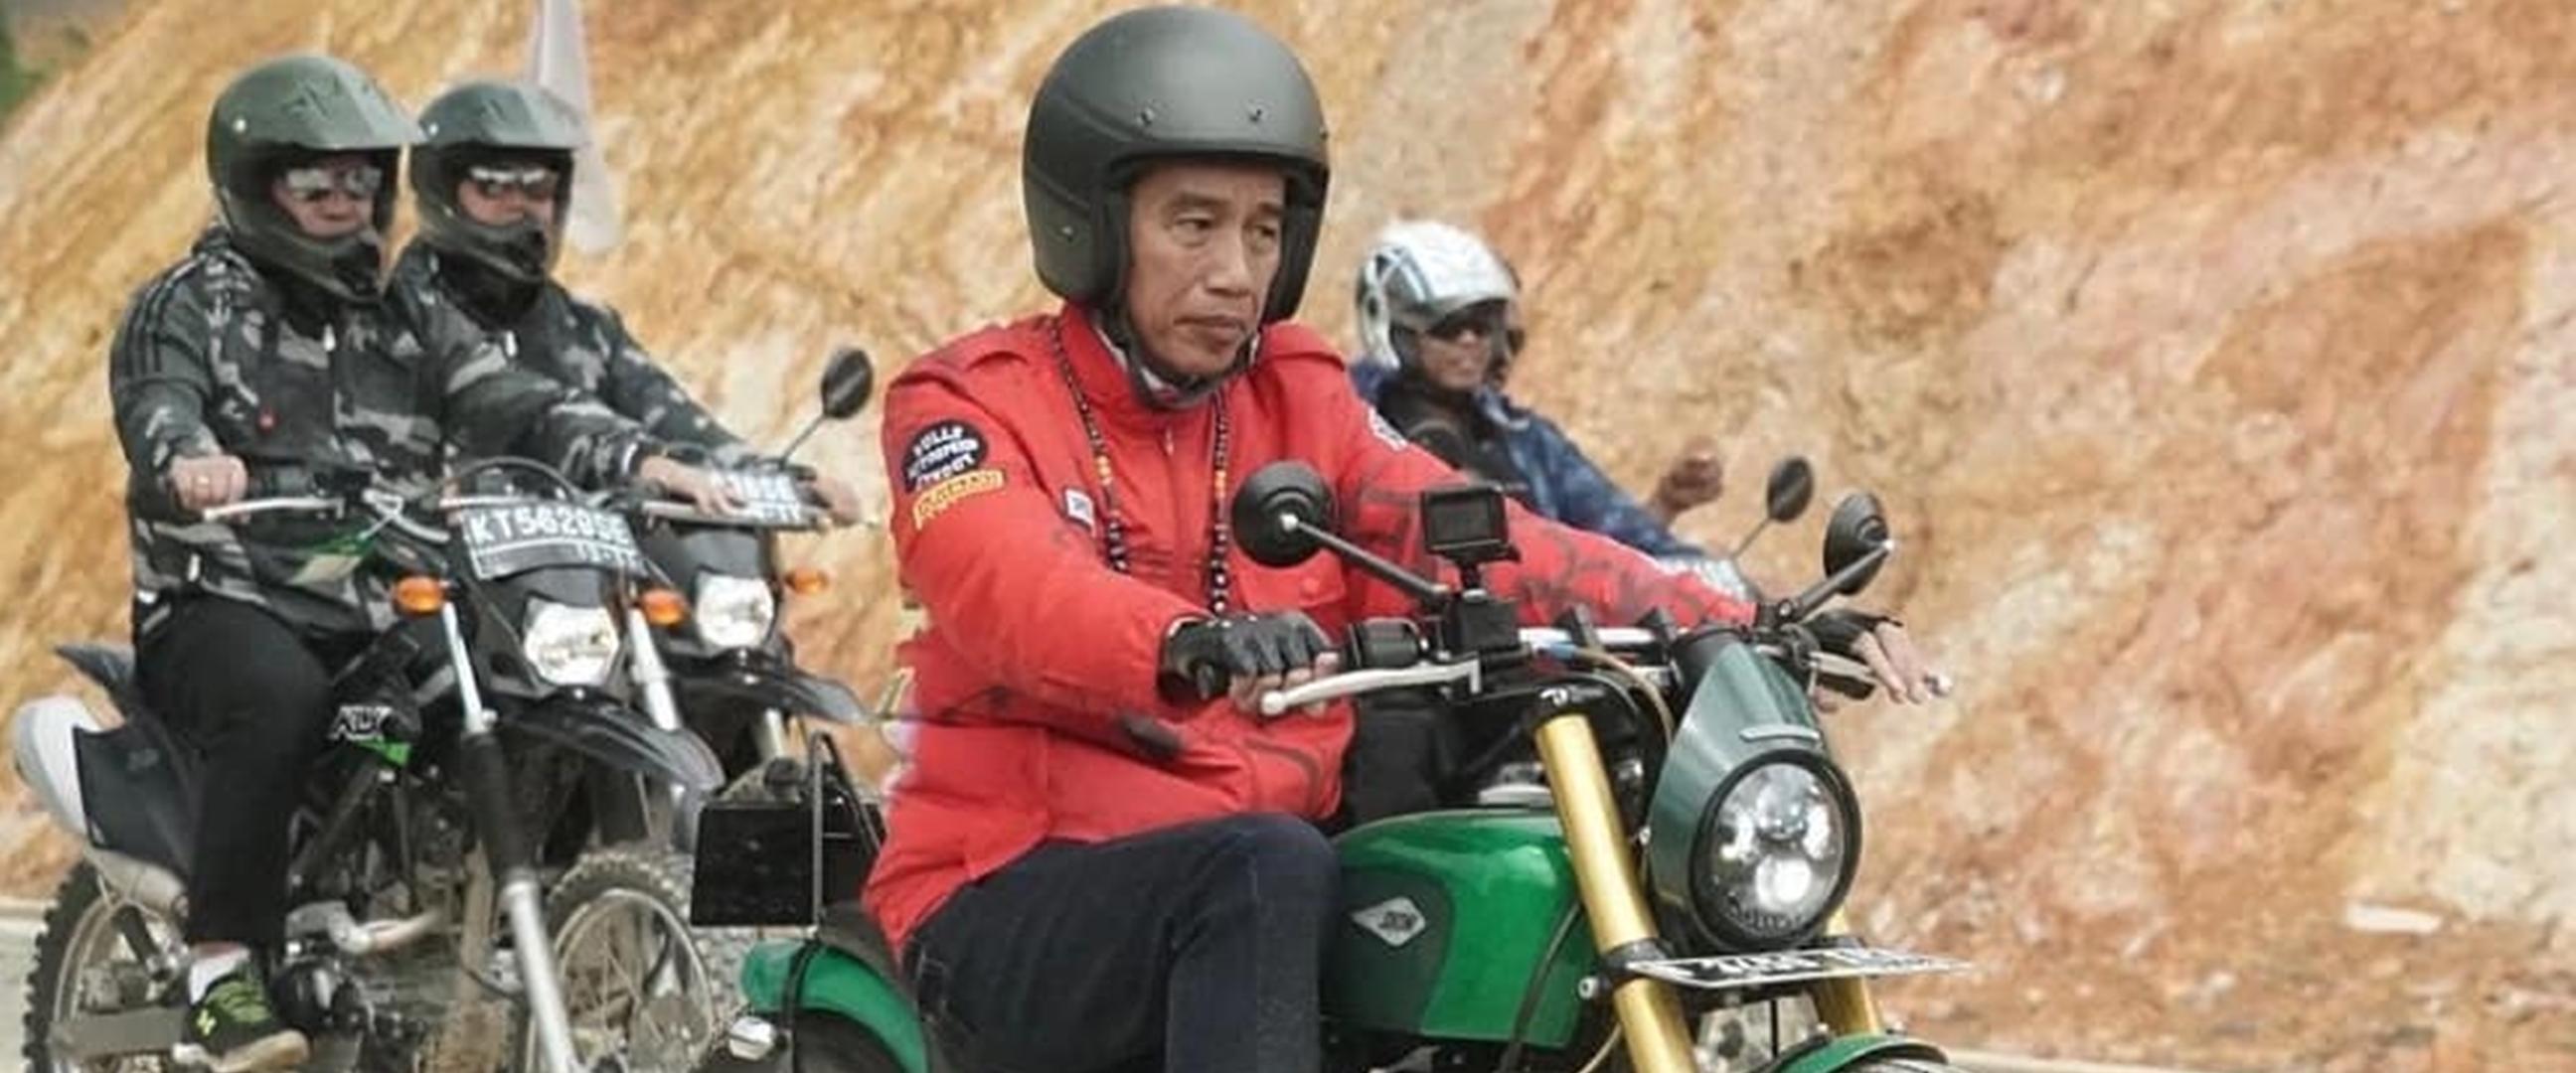 Gaya Jokowi naik motor custom di perbatasan Indonesia-Malaysia, gahar